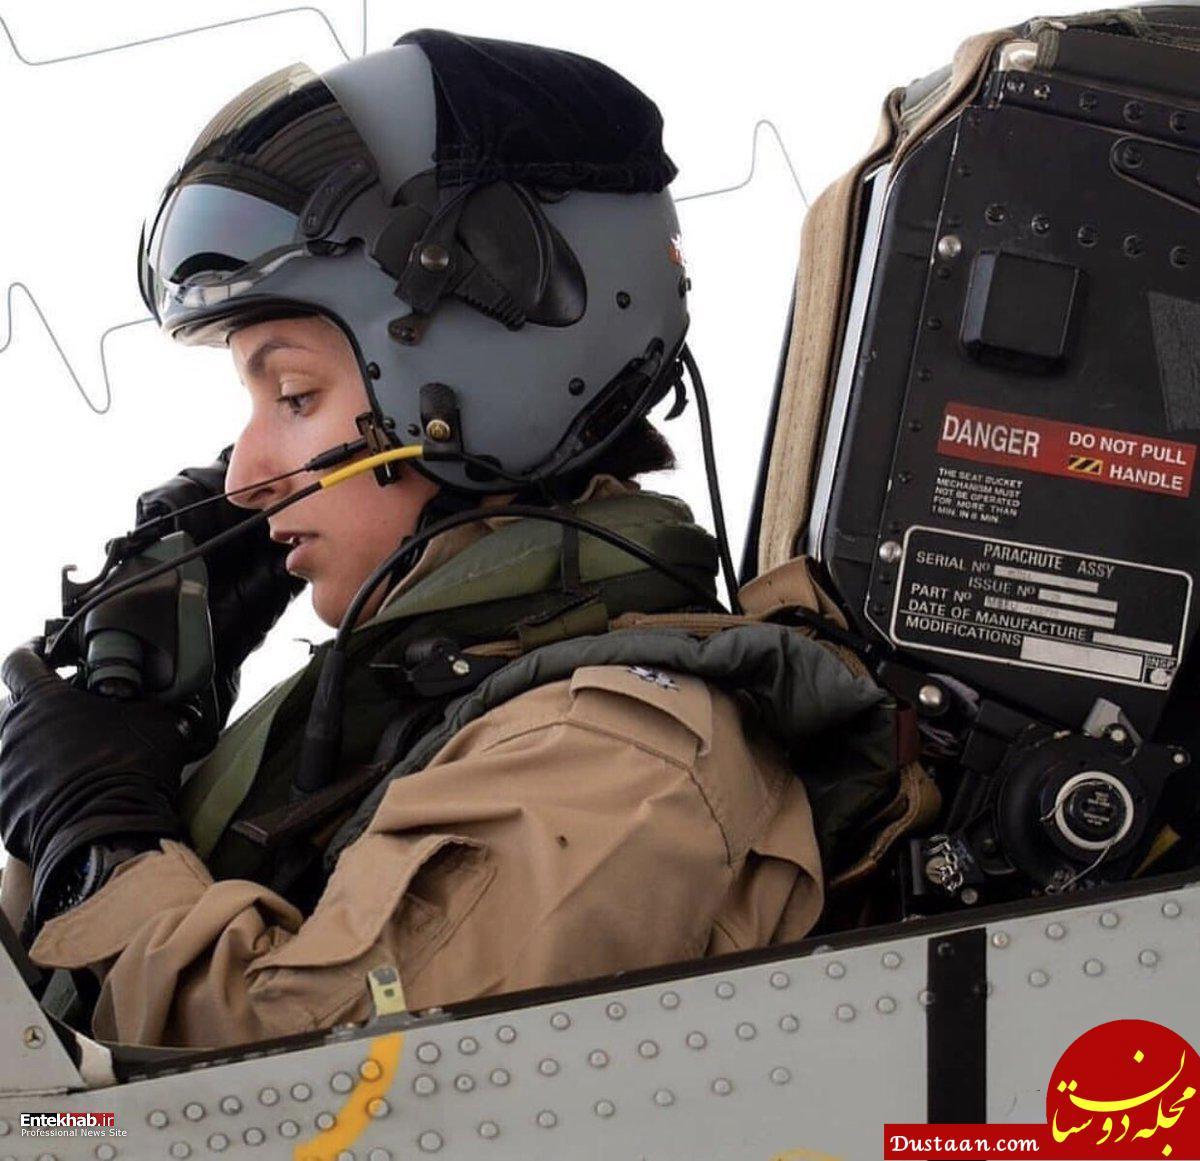 www.dustaan.com نخستین خلبان زن هواپیمای جنگنده در بحرین +تصاویر